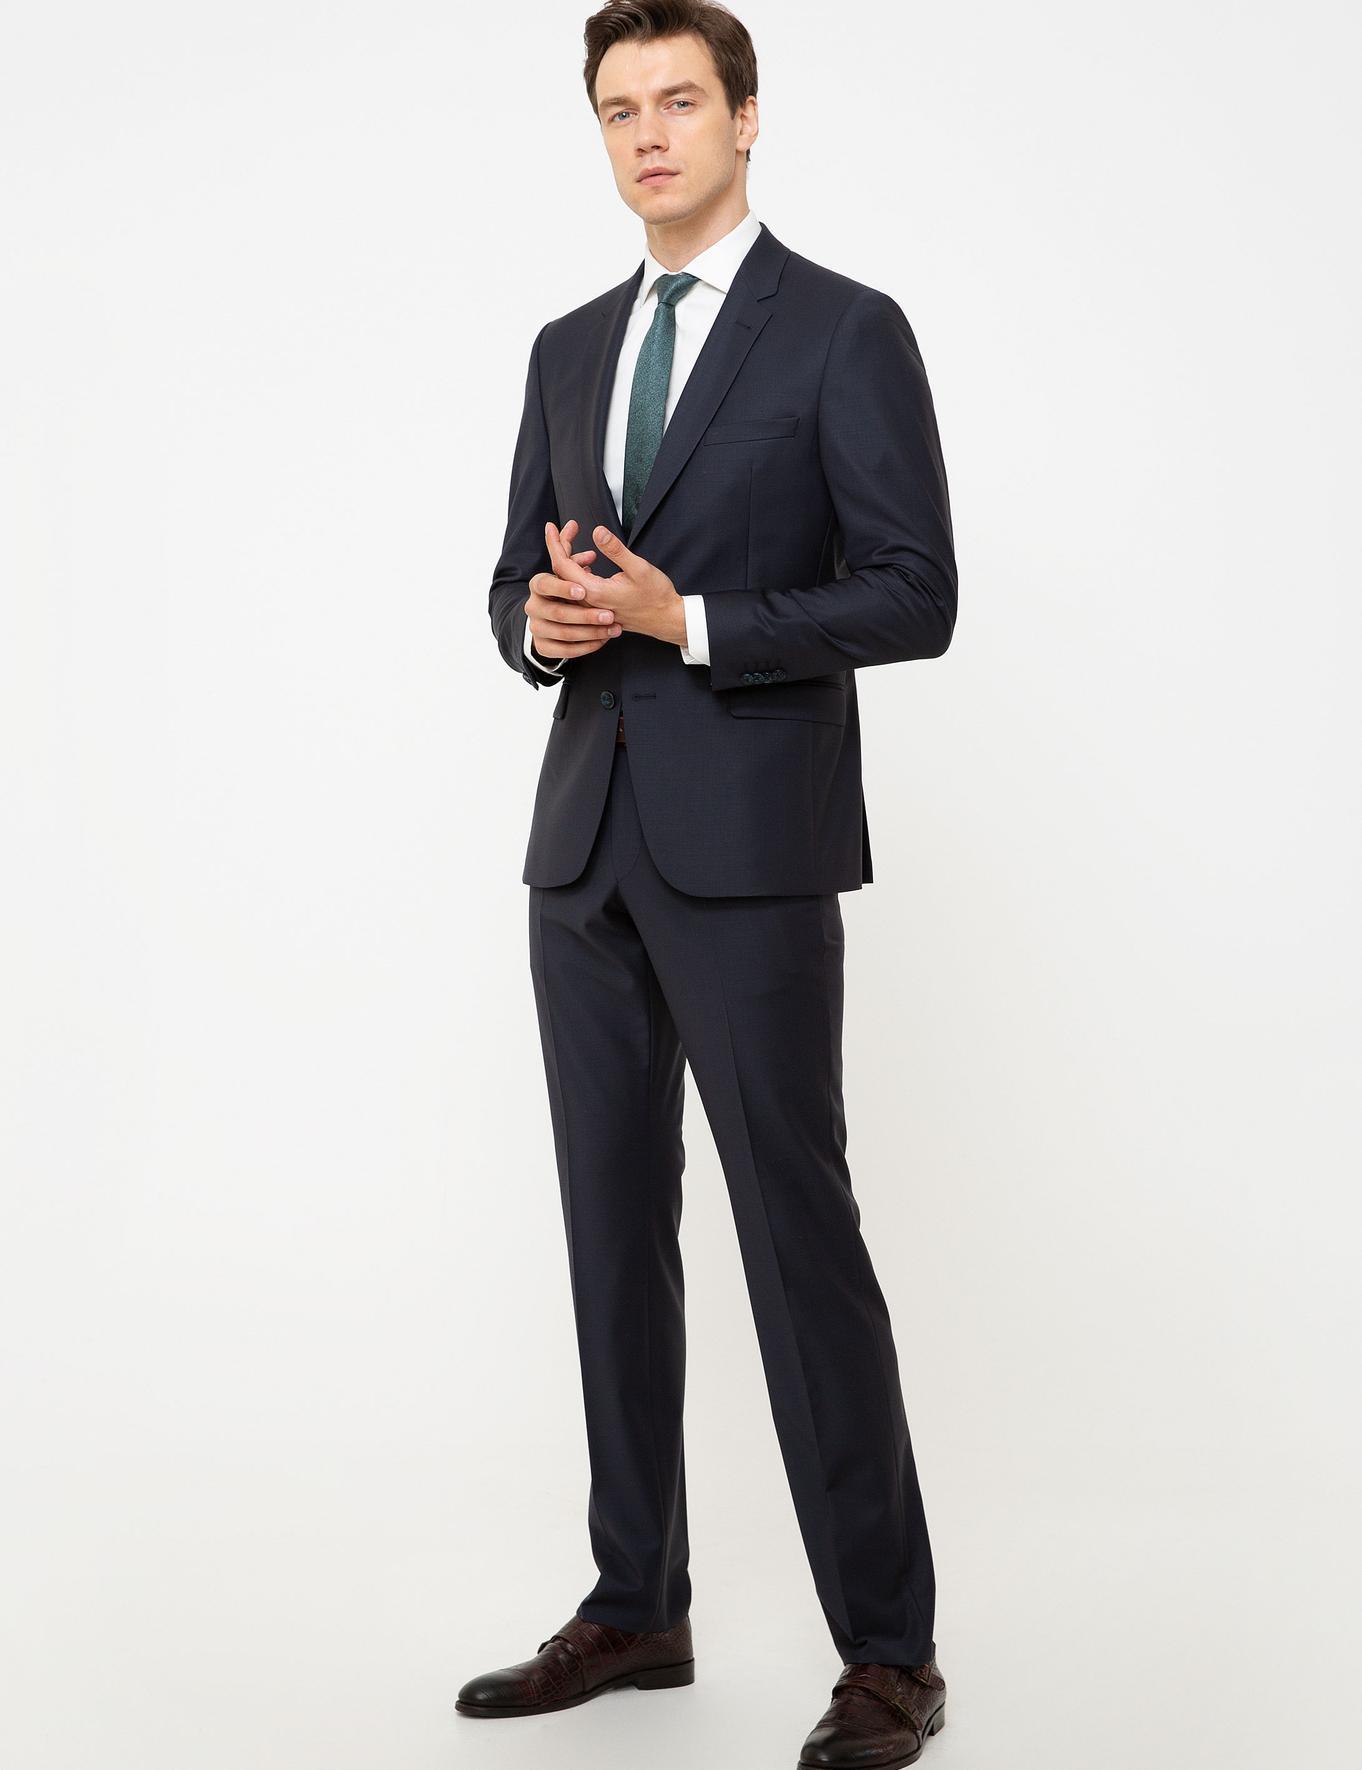 Açık Lacivert Slim Fit Takım Elbise - 50206330299